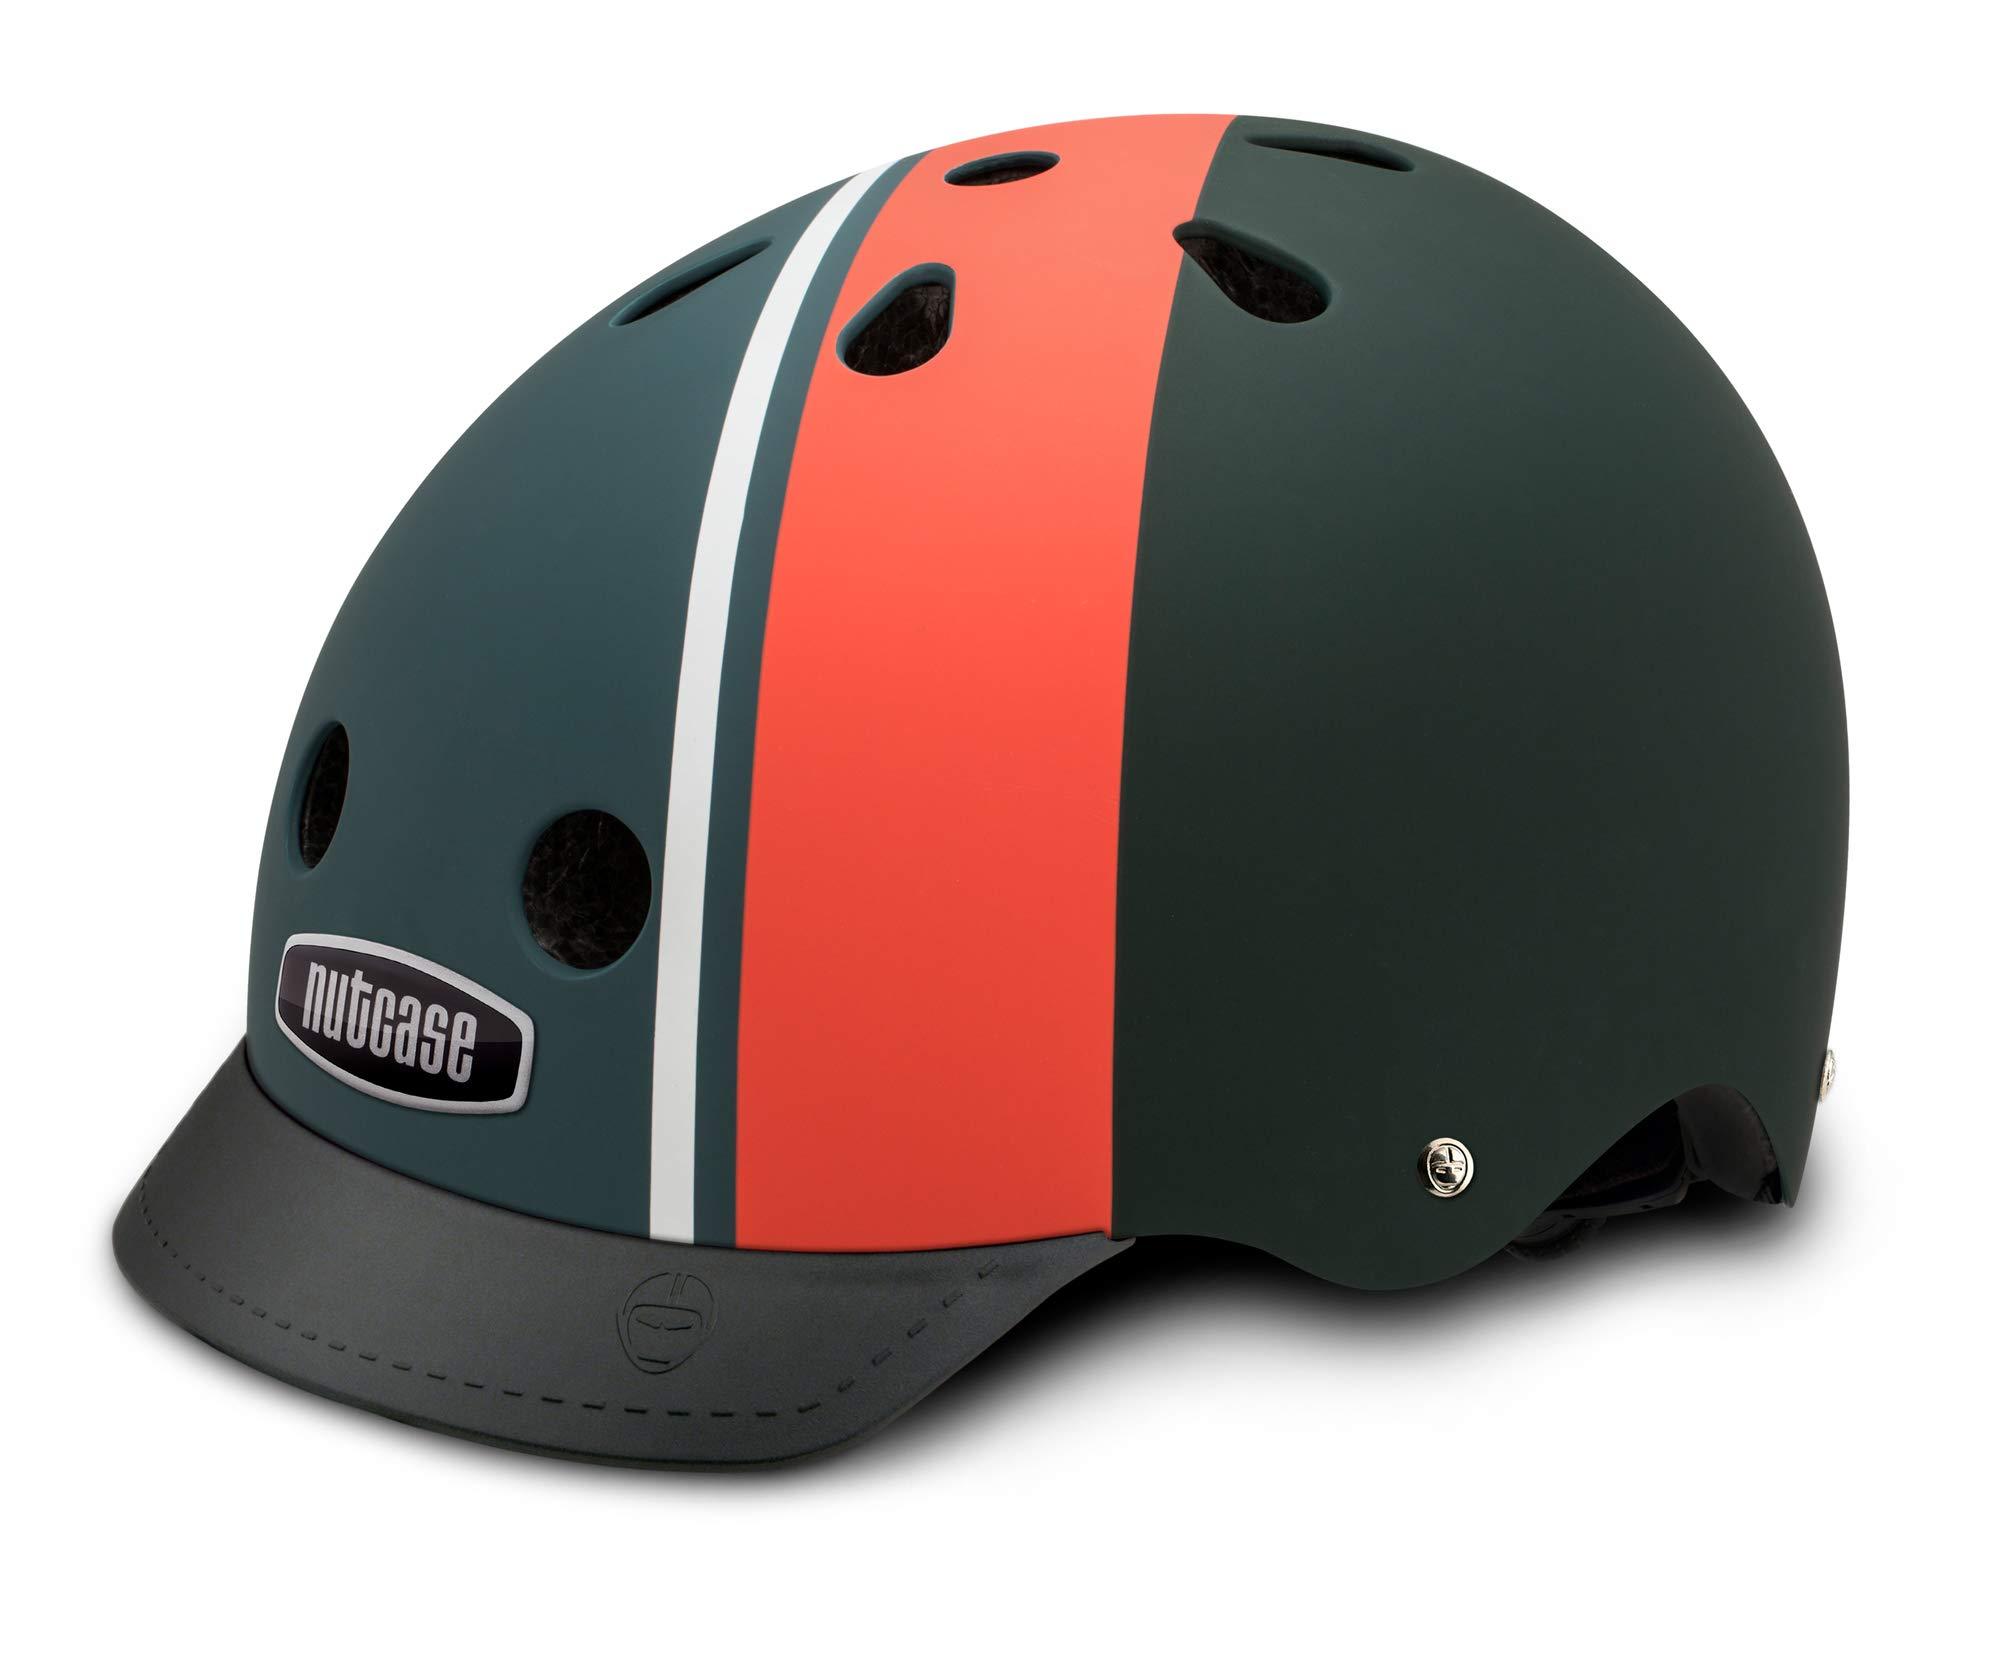 Nutcase - Patterned Street Bike Helmet for Adults, Element Stripe Matte, L